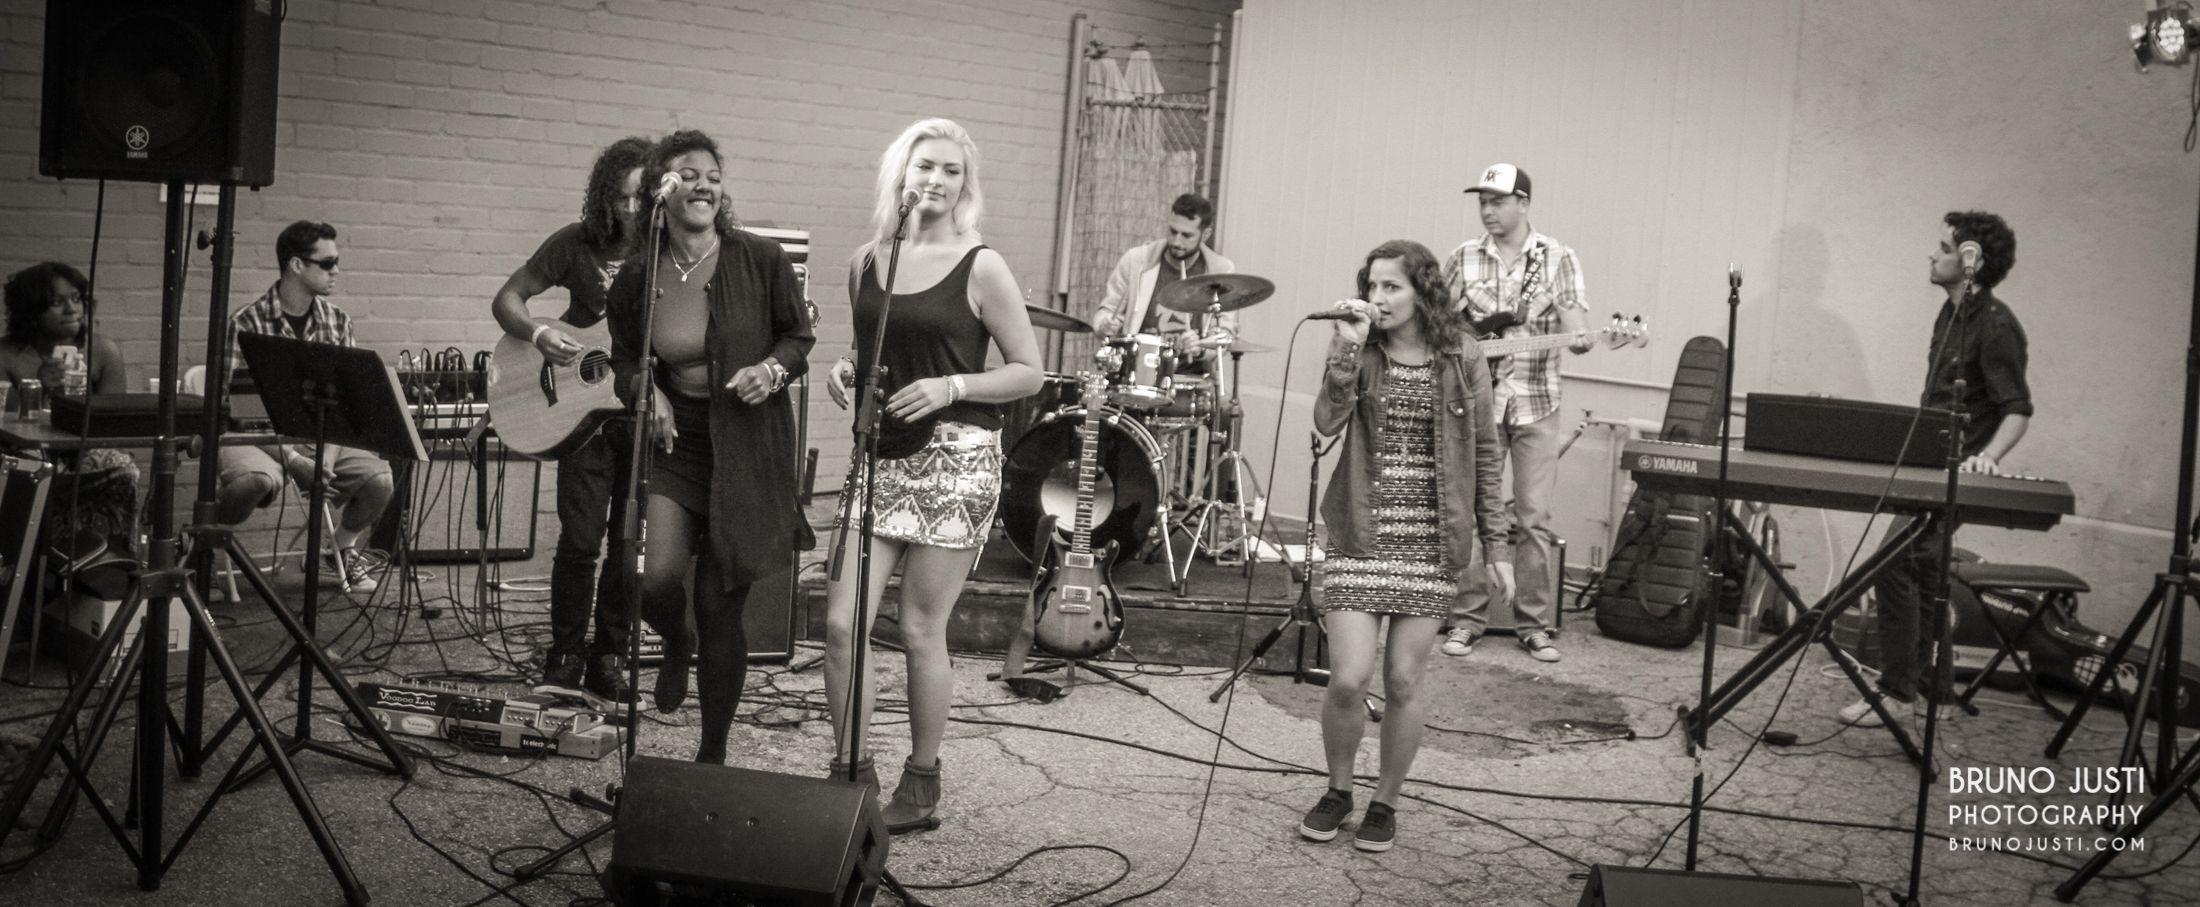 Band: The Somethings Left to right: Anwar G., Felicia S., Mikaela H., Nick B., Christina P., Alfredo L., Tyler B. Photo courtesy: Bruno Justi Photography